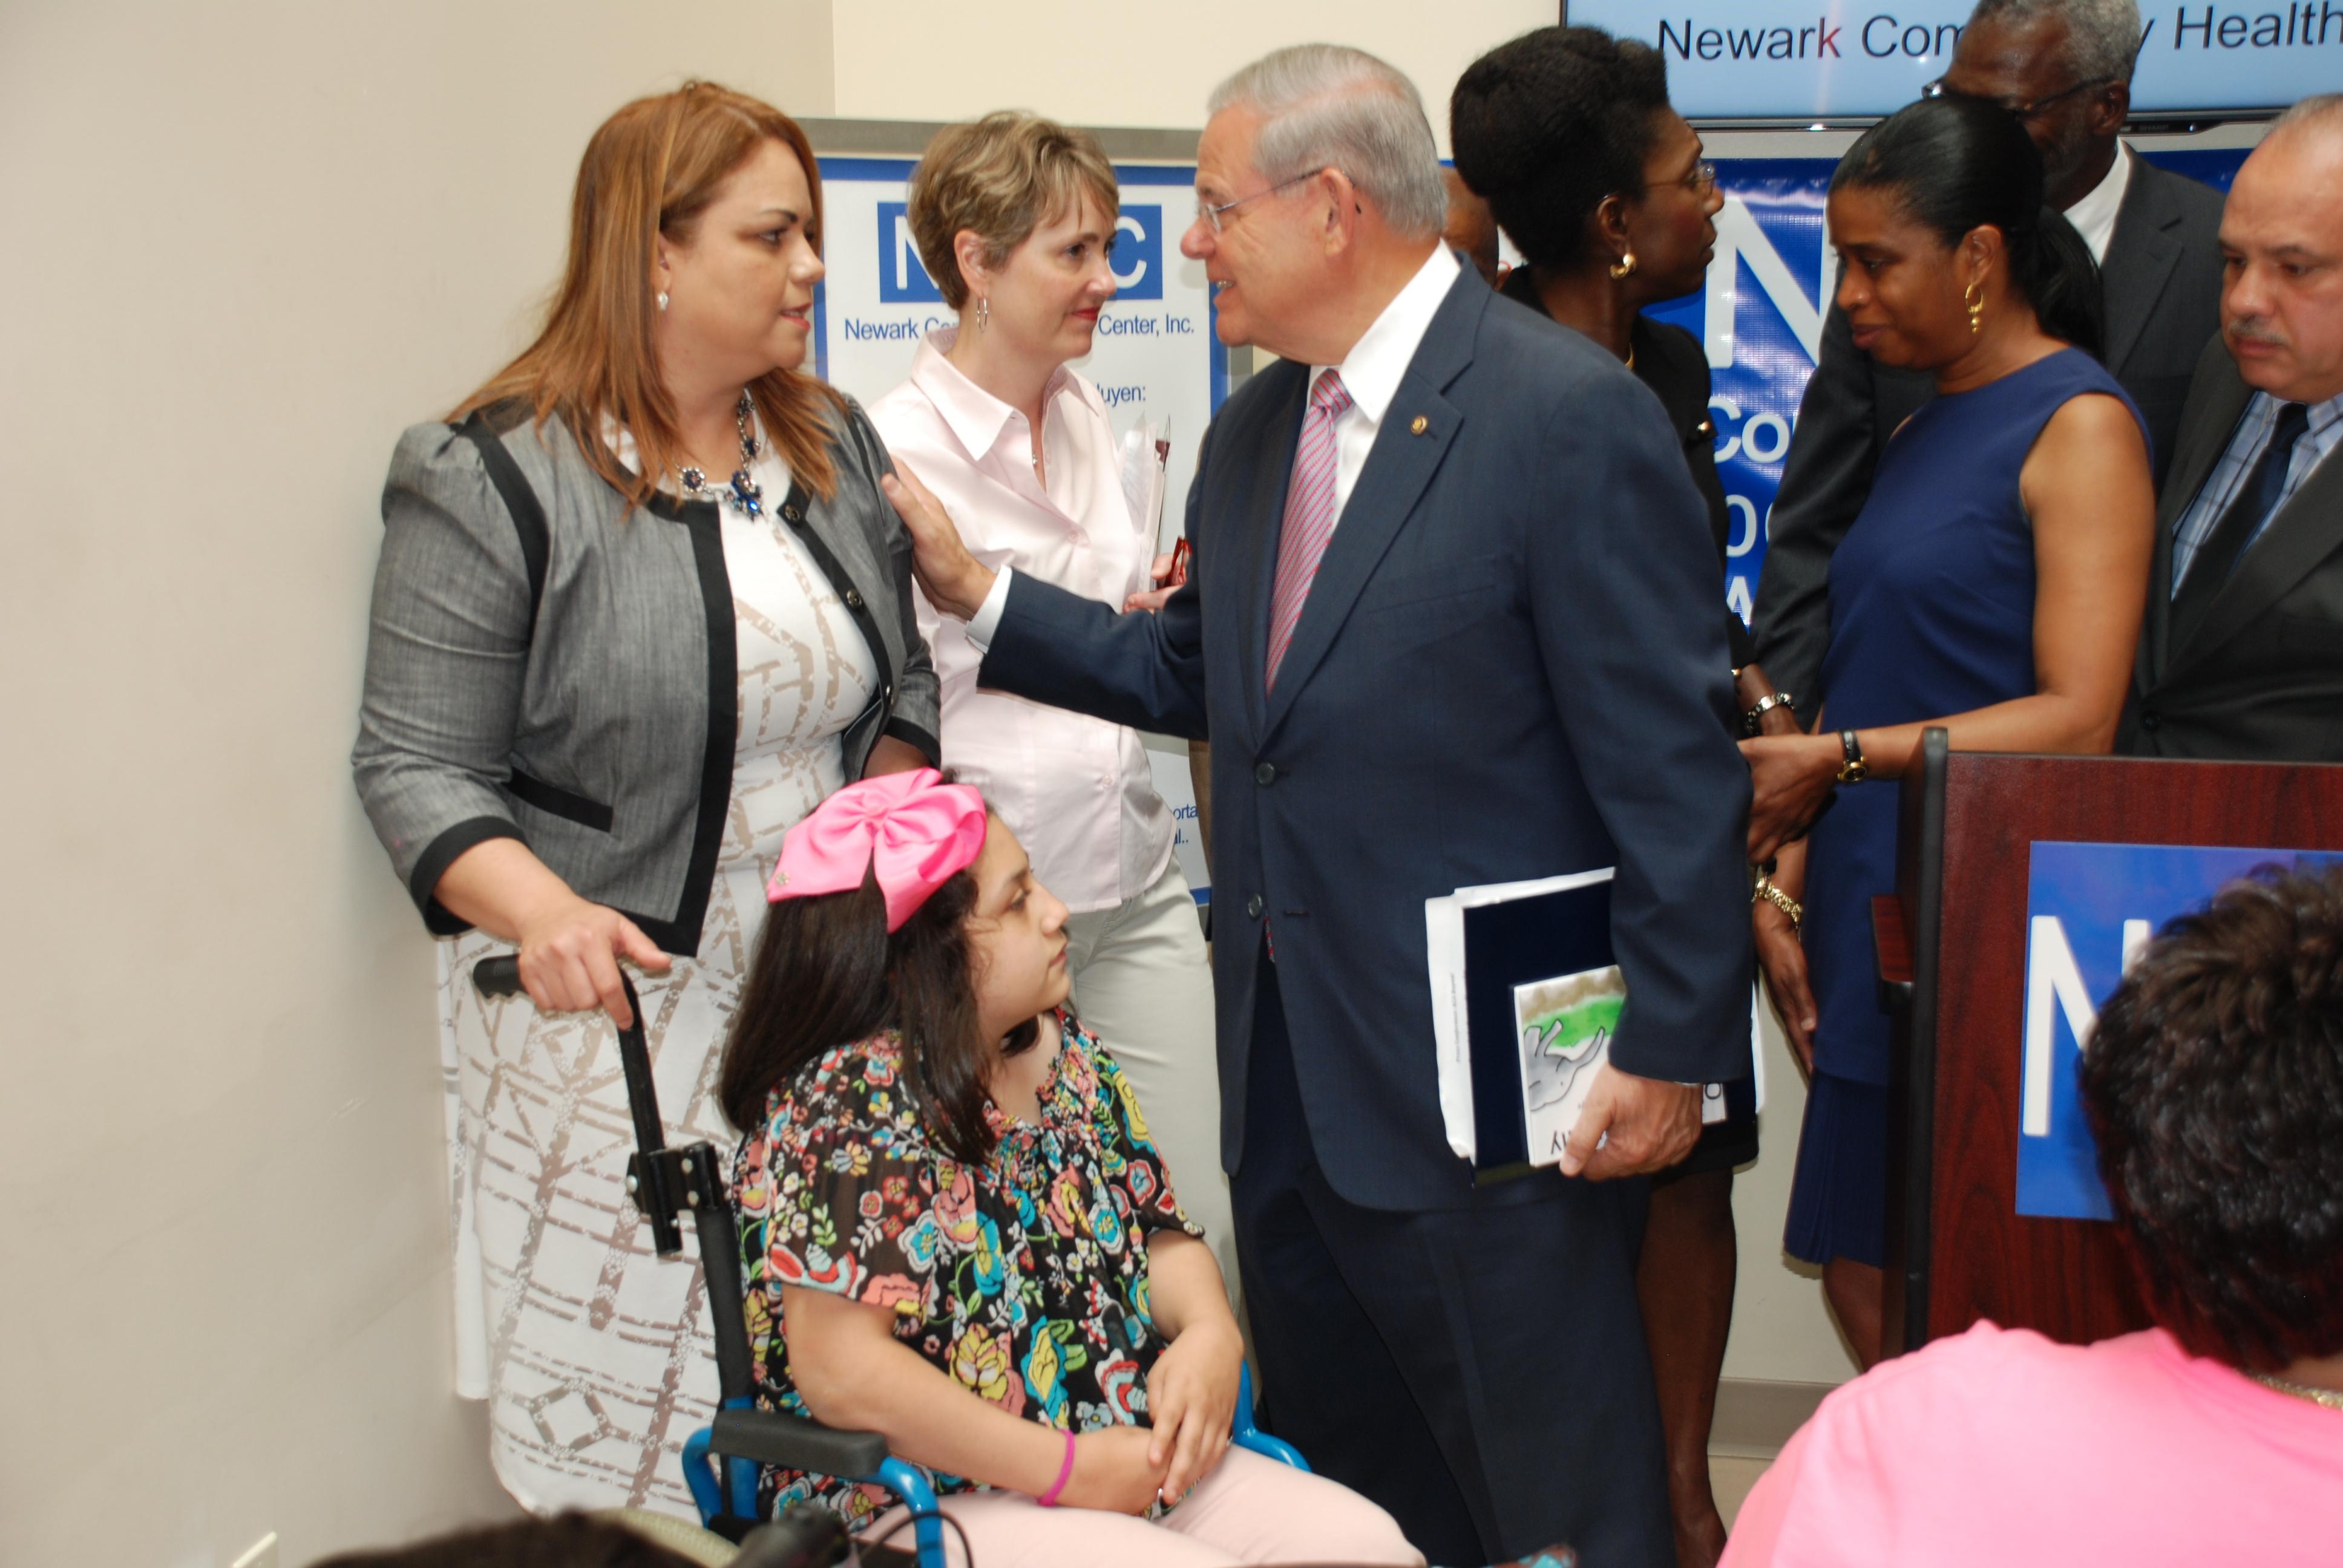 Menendez Joined by NJ Families Abandoned by Heartless GOP Health Bill 6-23-17 (34677882883).jpg Senator Bob Menendez was joined by New Jerseyans